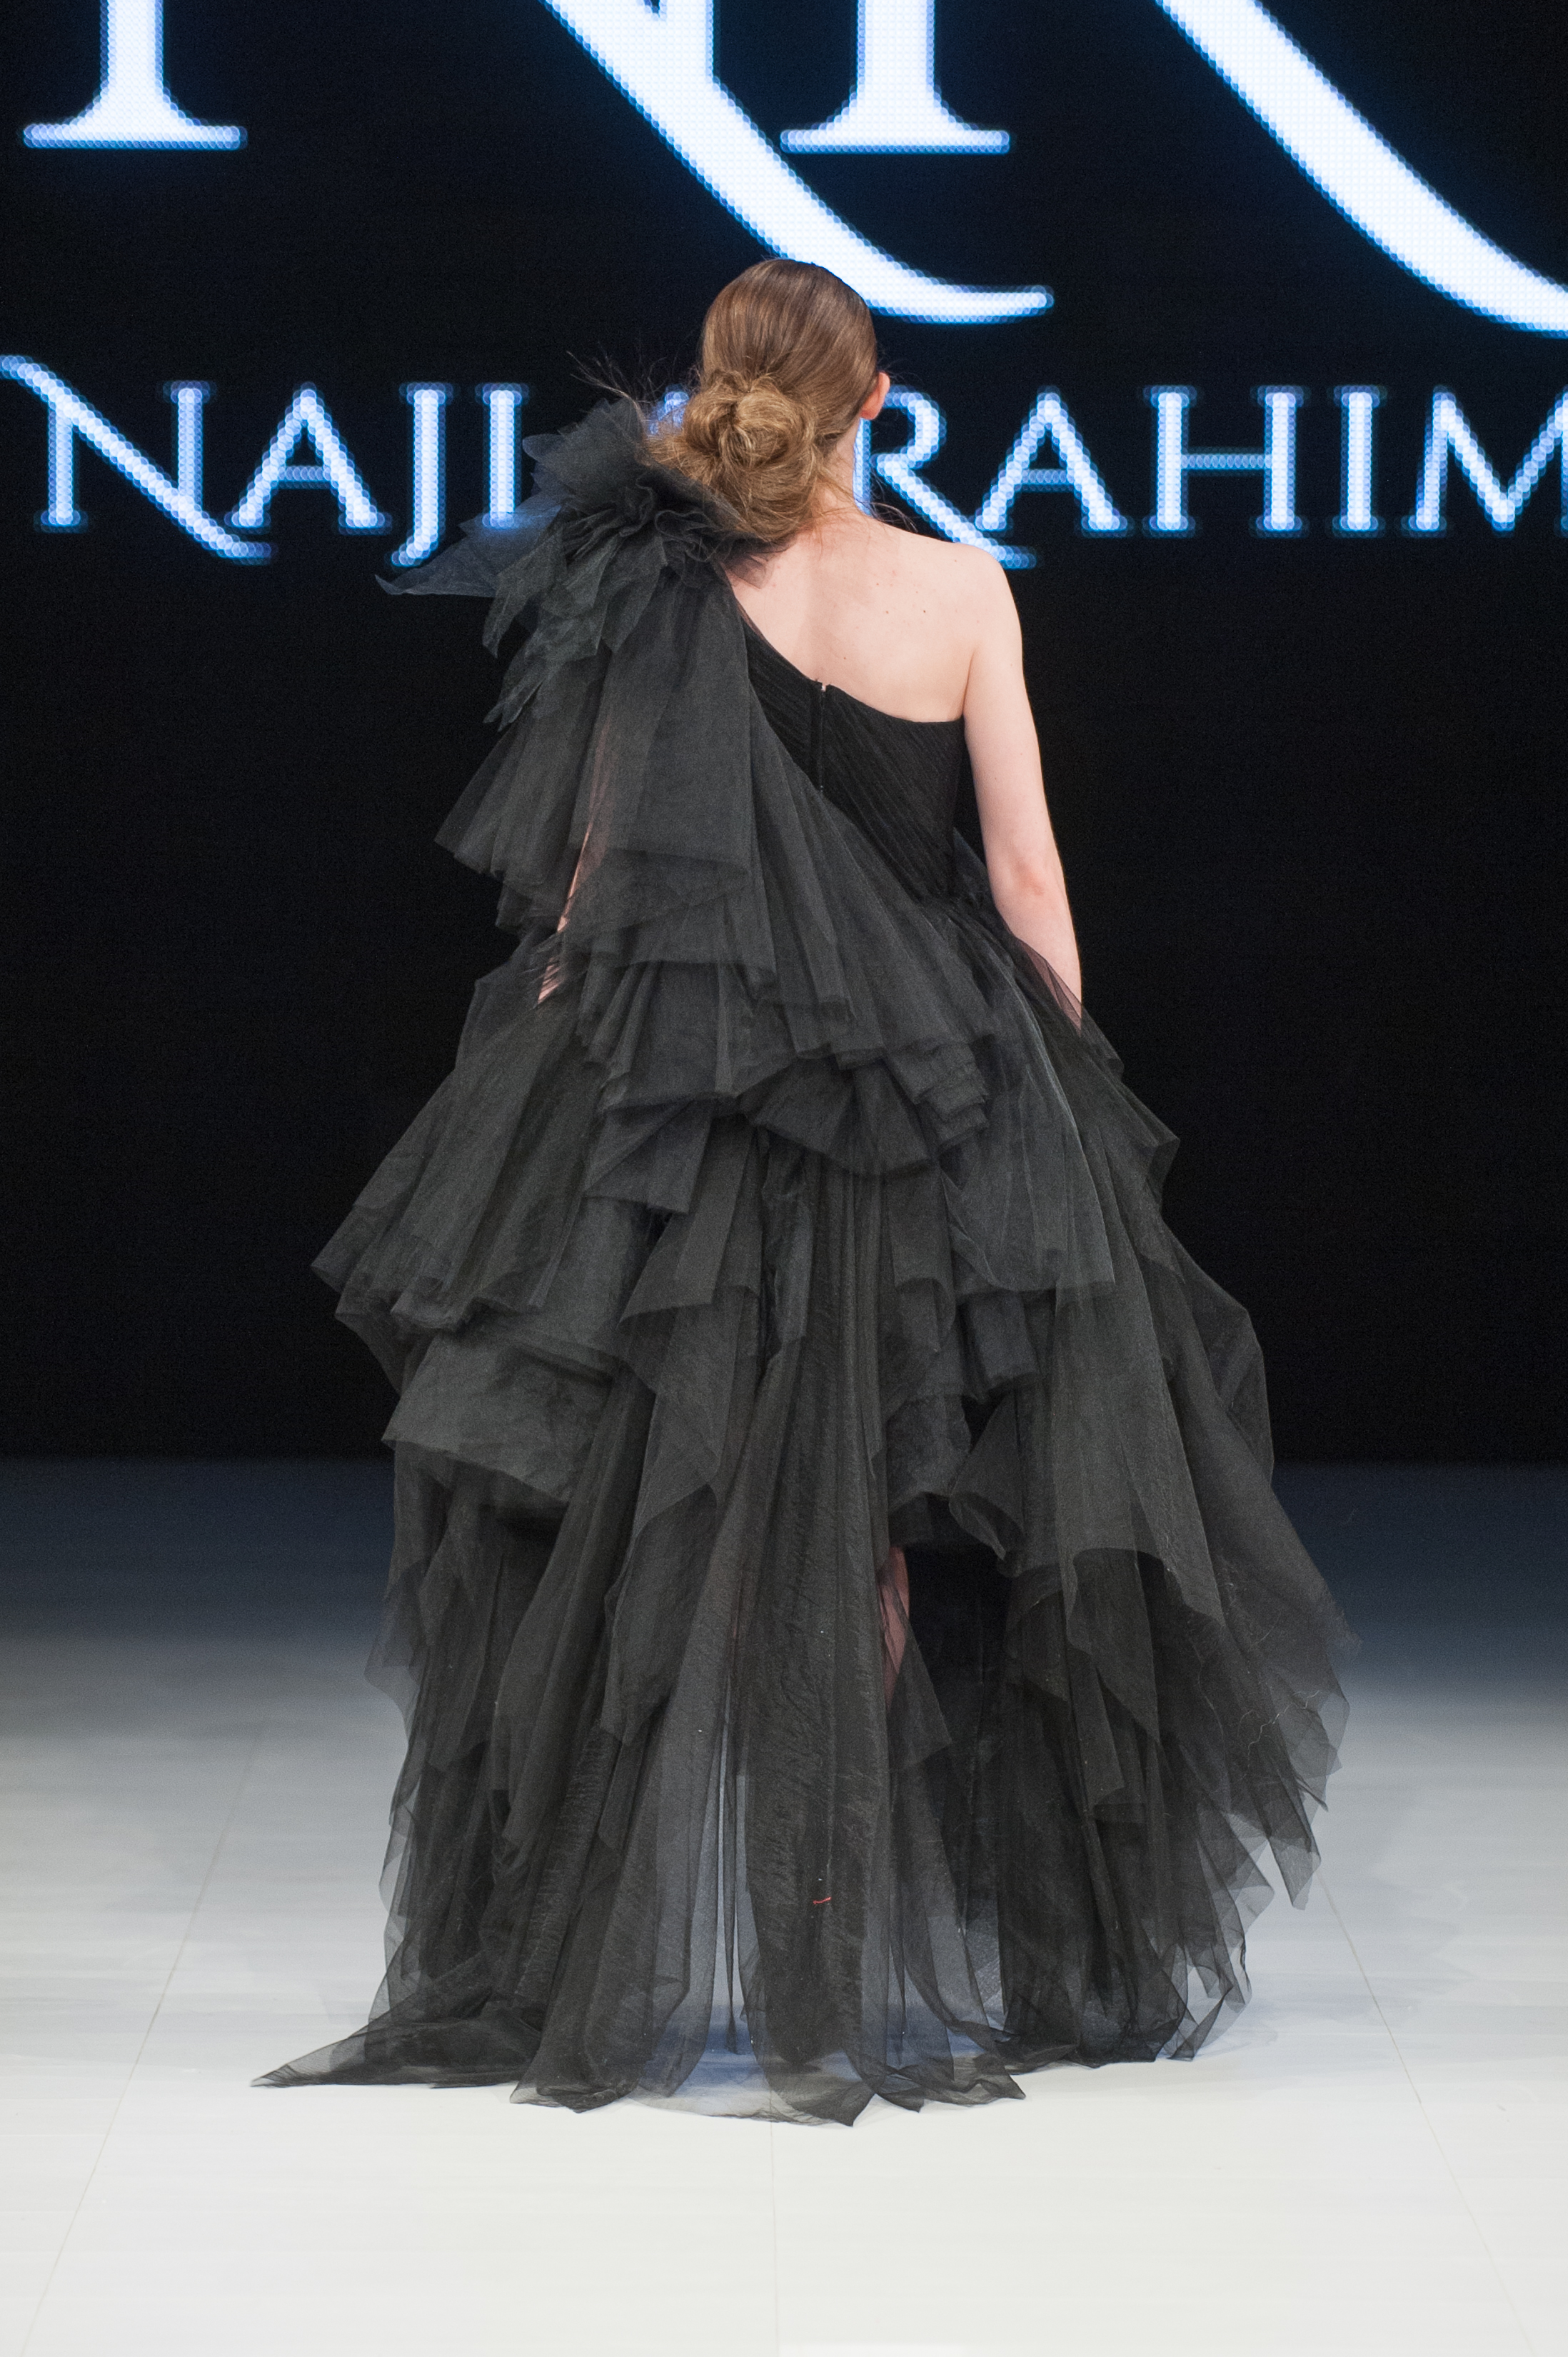 FAT2018-Day1-April17-Najla_Rahimi-Runway-Che_Rosales-LARAWAN-5717.jpg